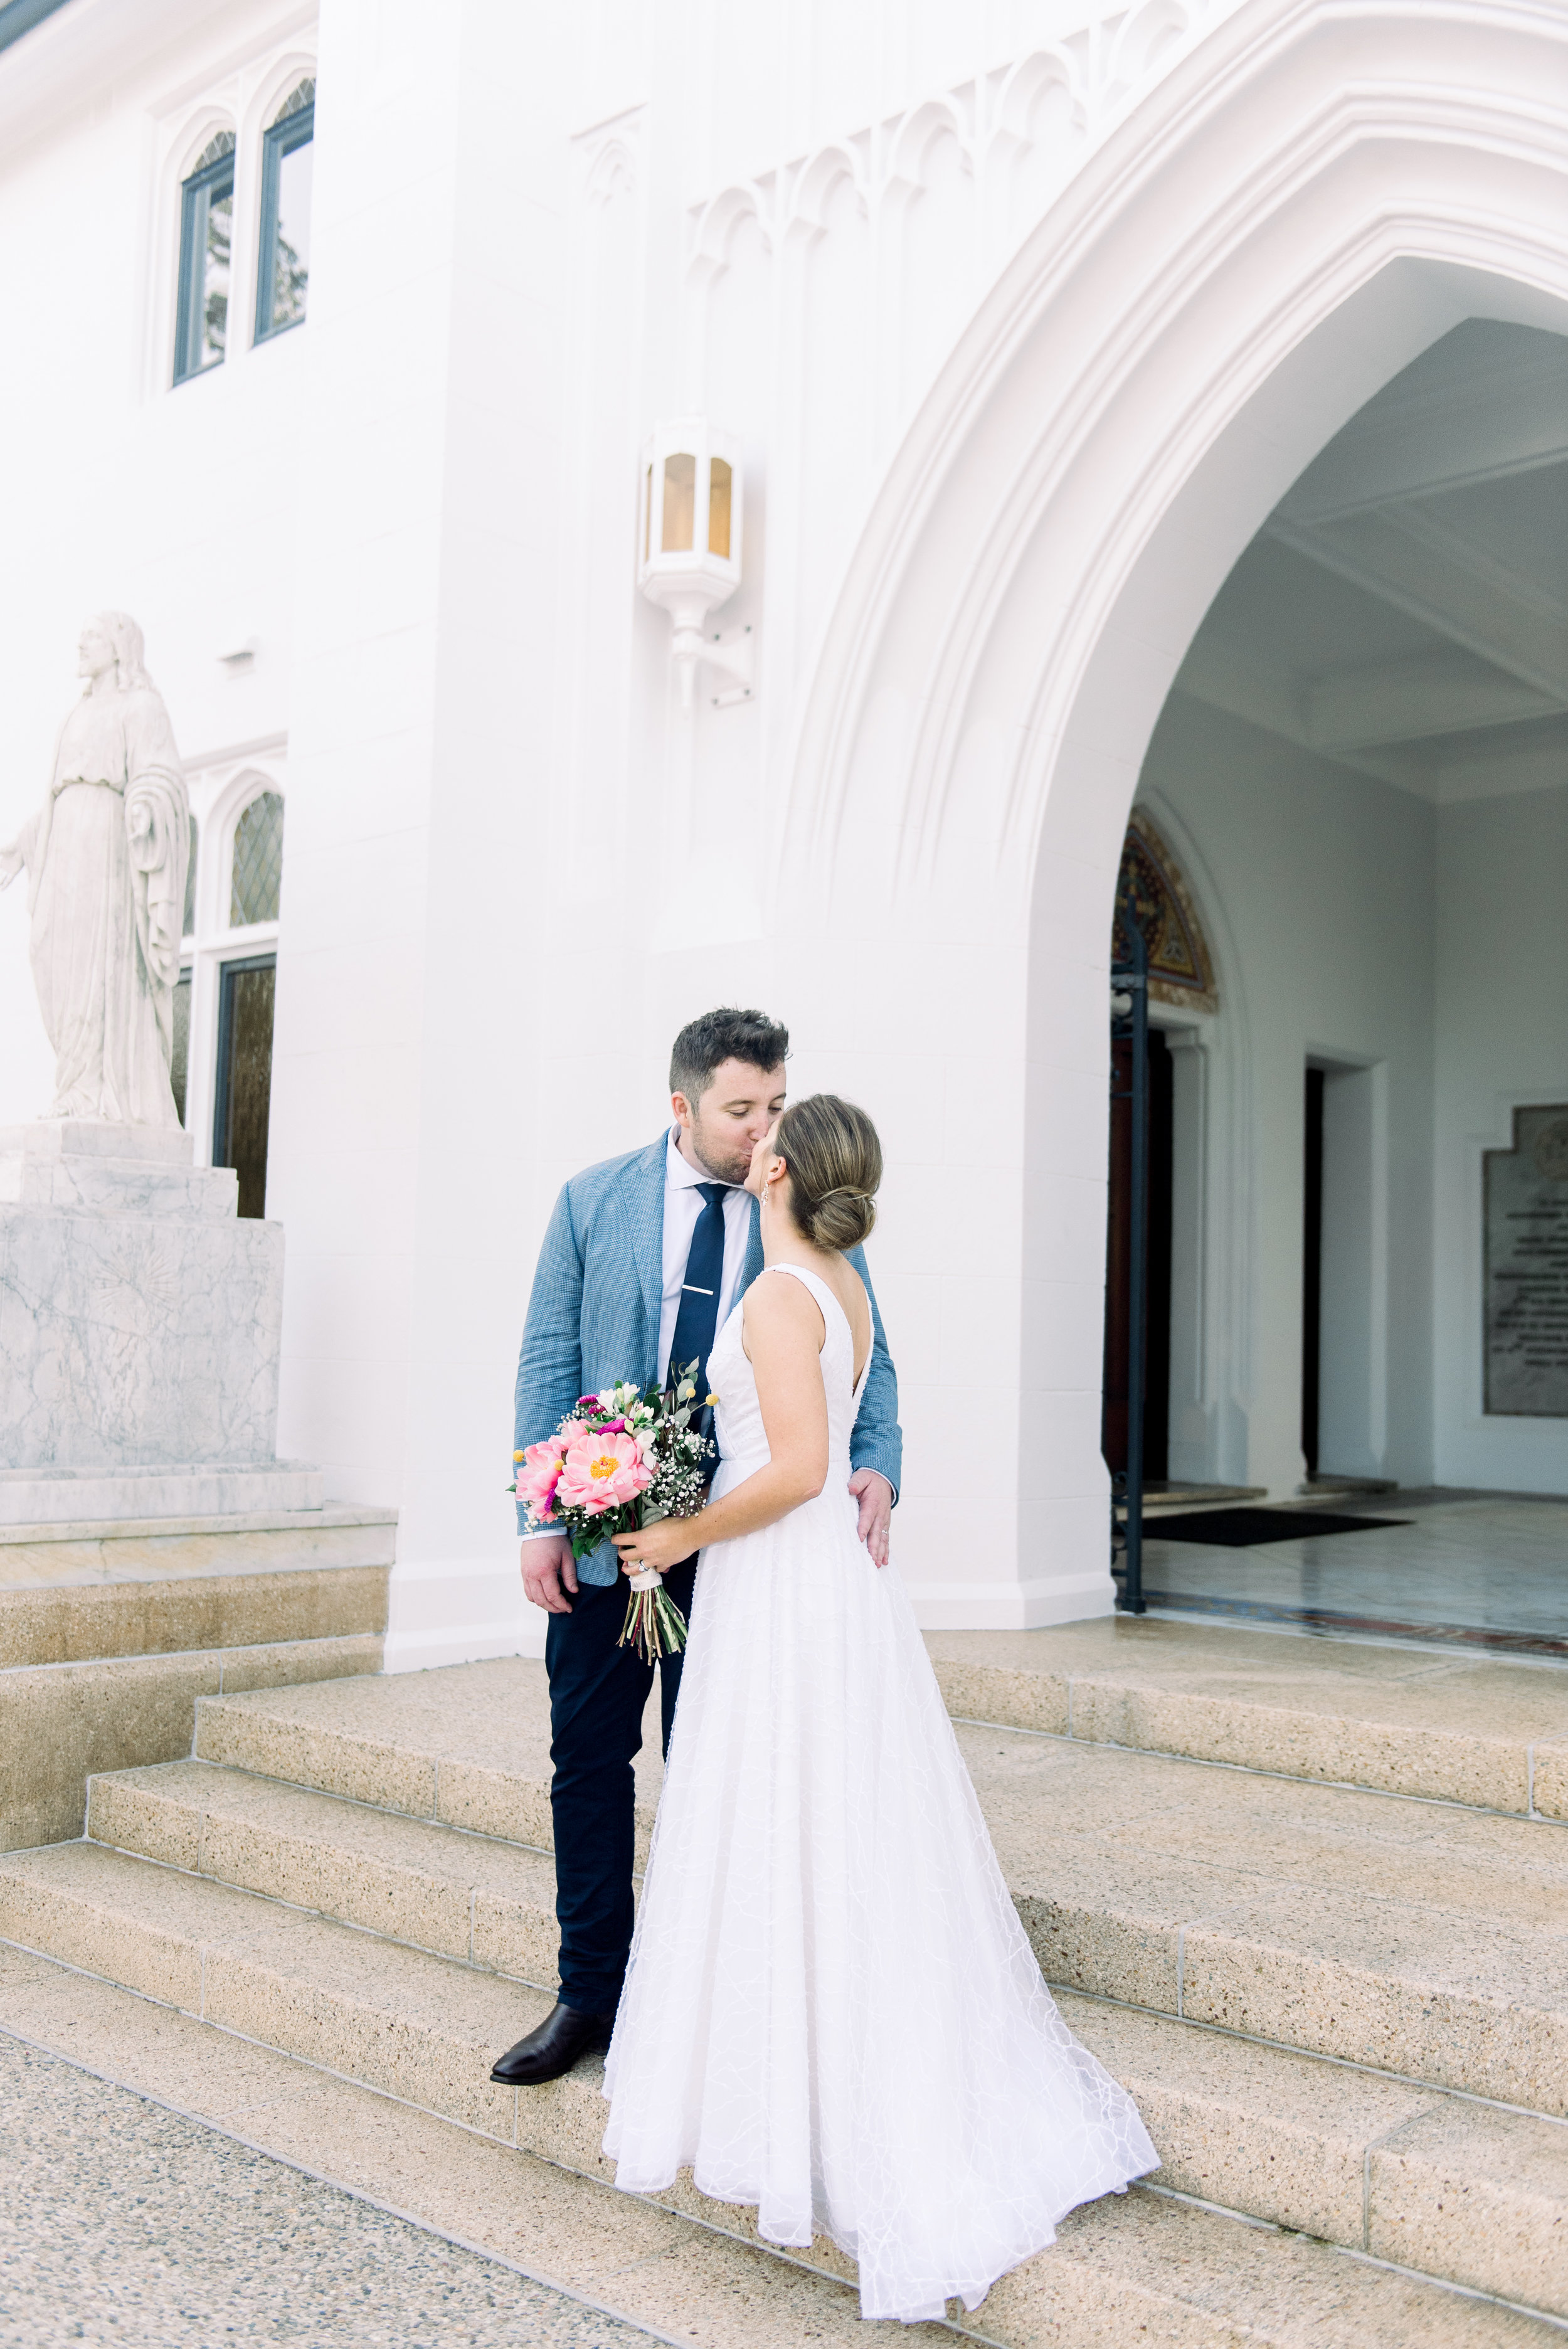 refinery-wedding-brisbane-city-wedding-photographer-54.jpg